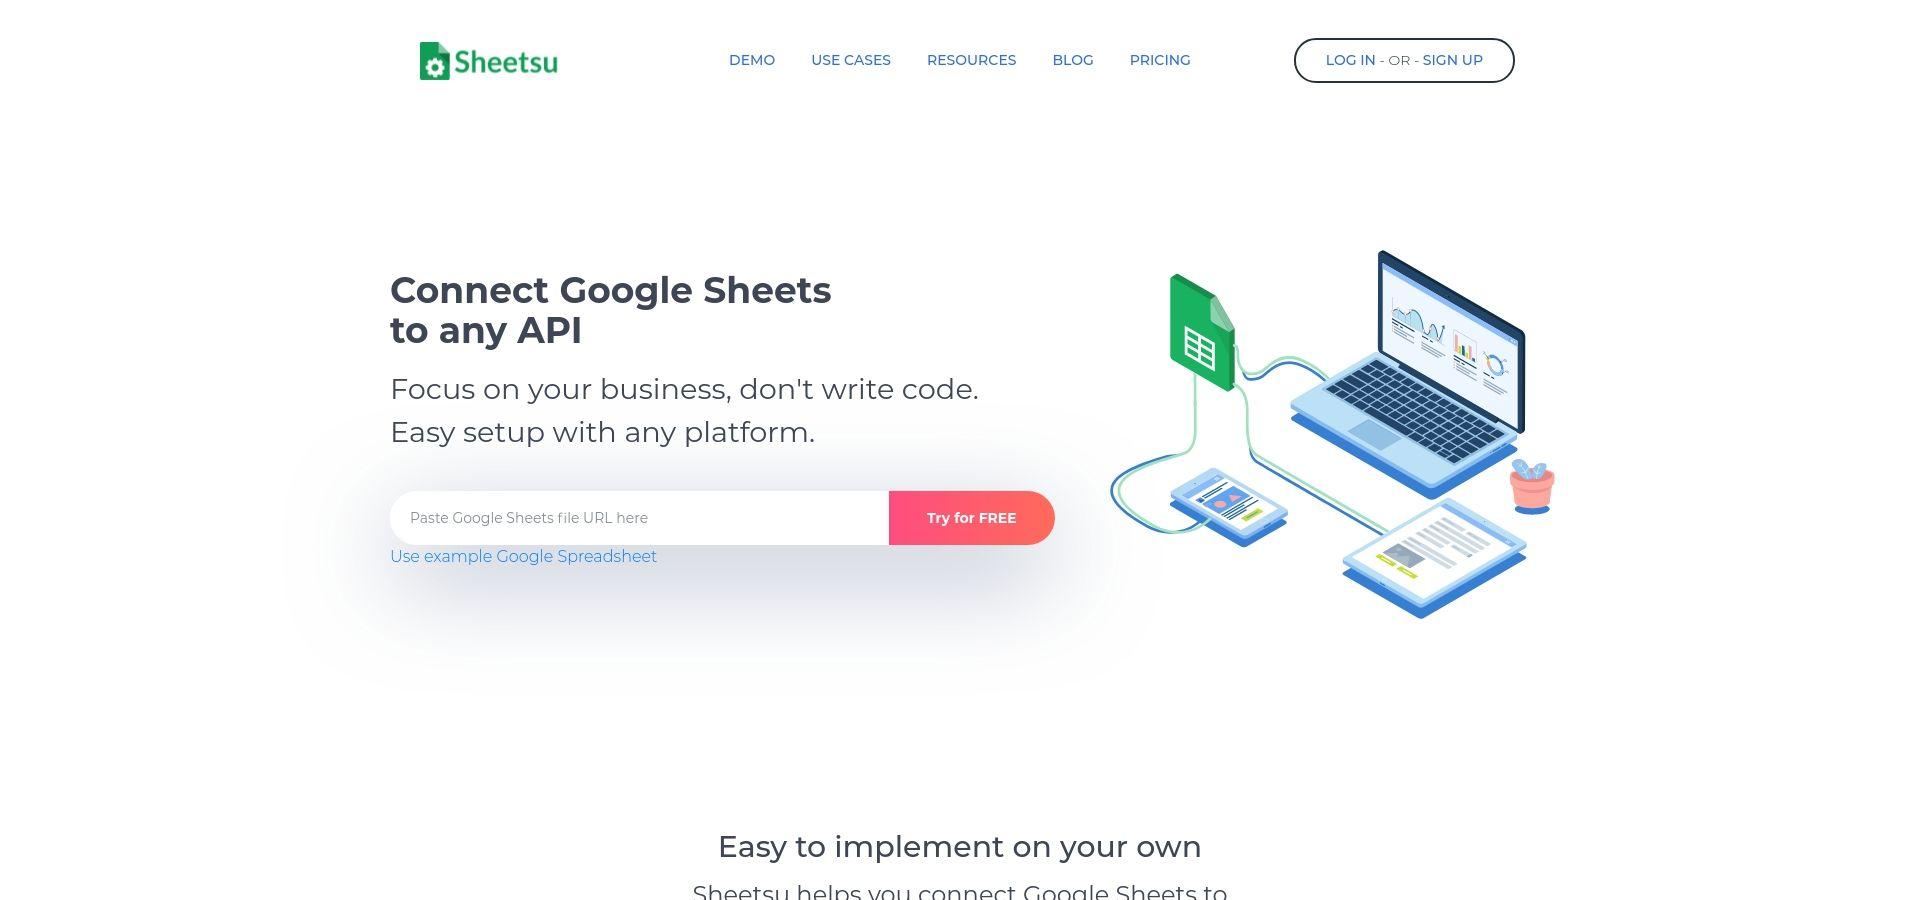 Google Sheets API, Turn Google Spreadsheet Into API – Sheetsu